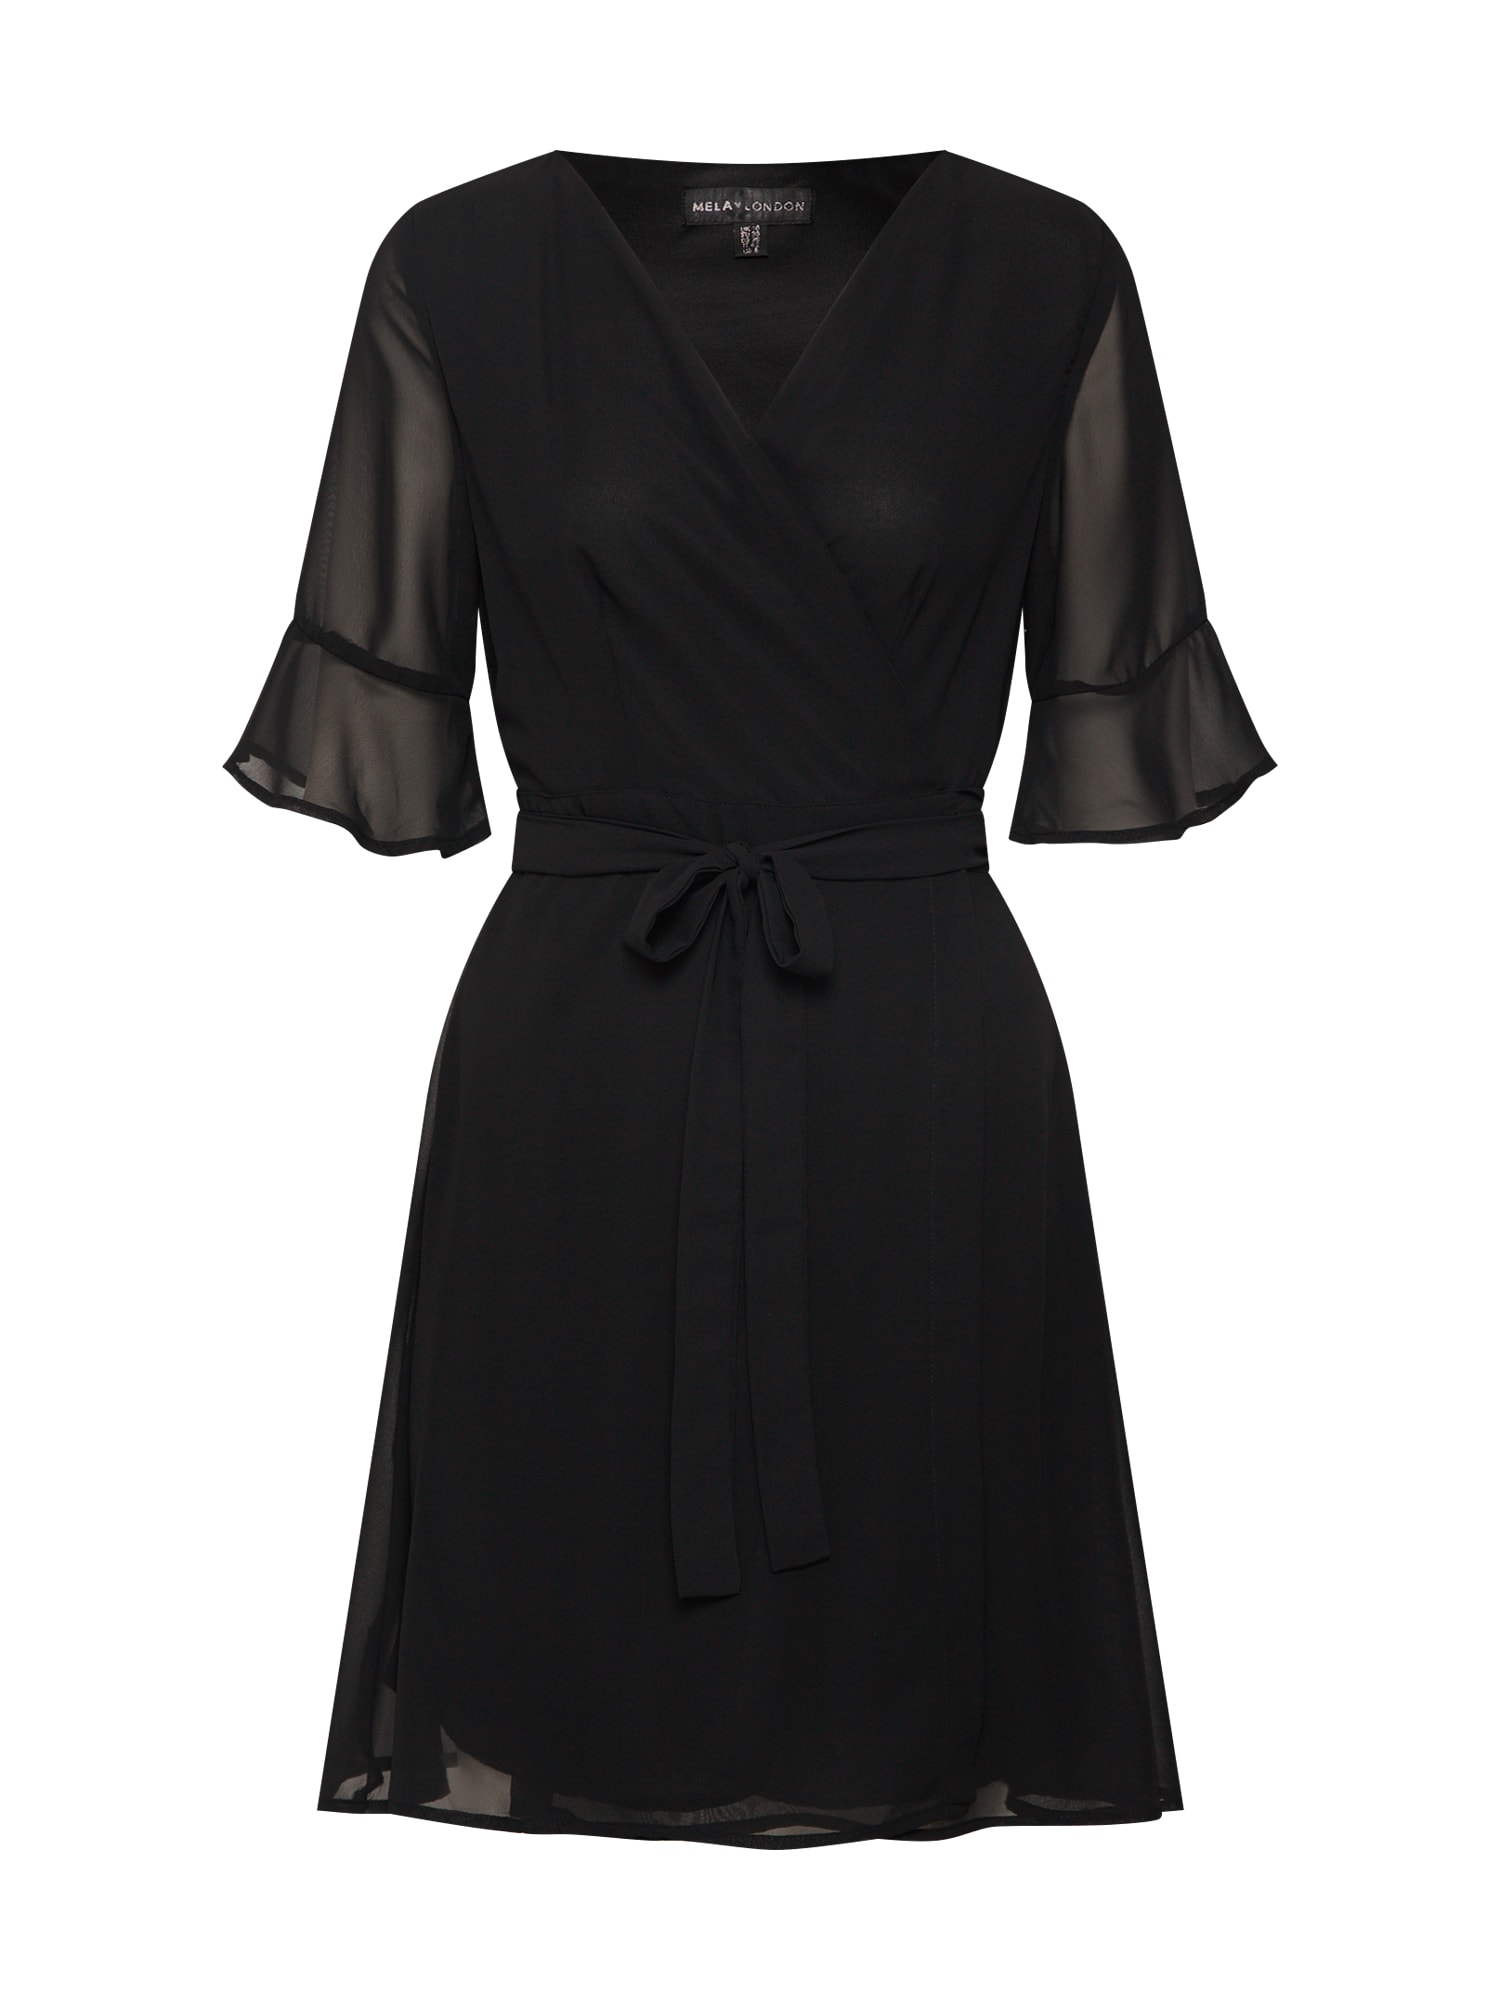 Šaty SHEER SLEEVE WRAP DRESS černá Mela London